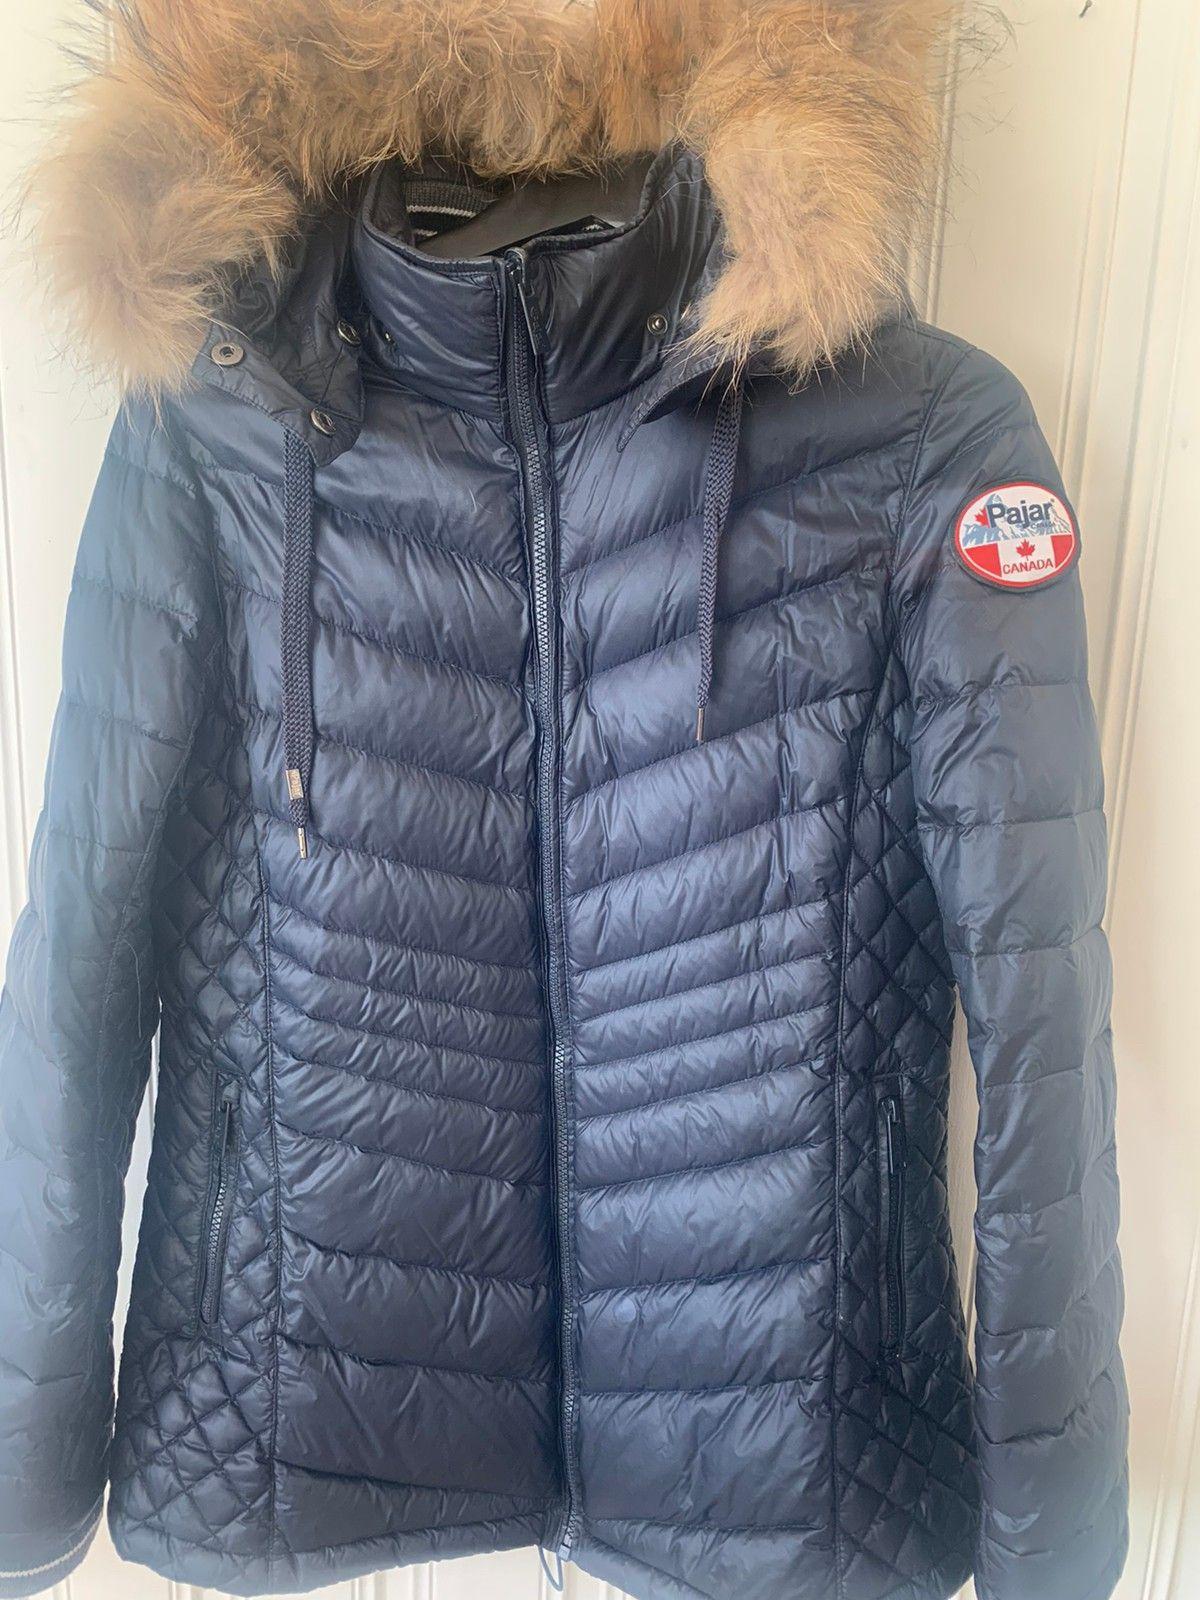 Pajar jakke blå | FINN.no